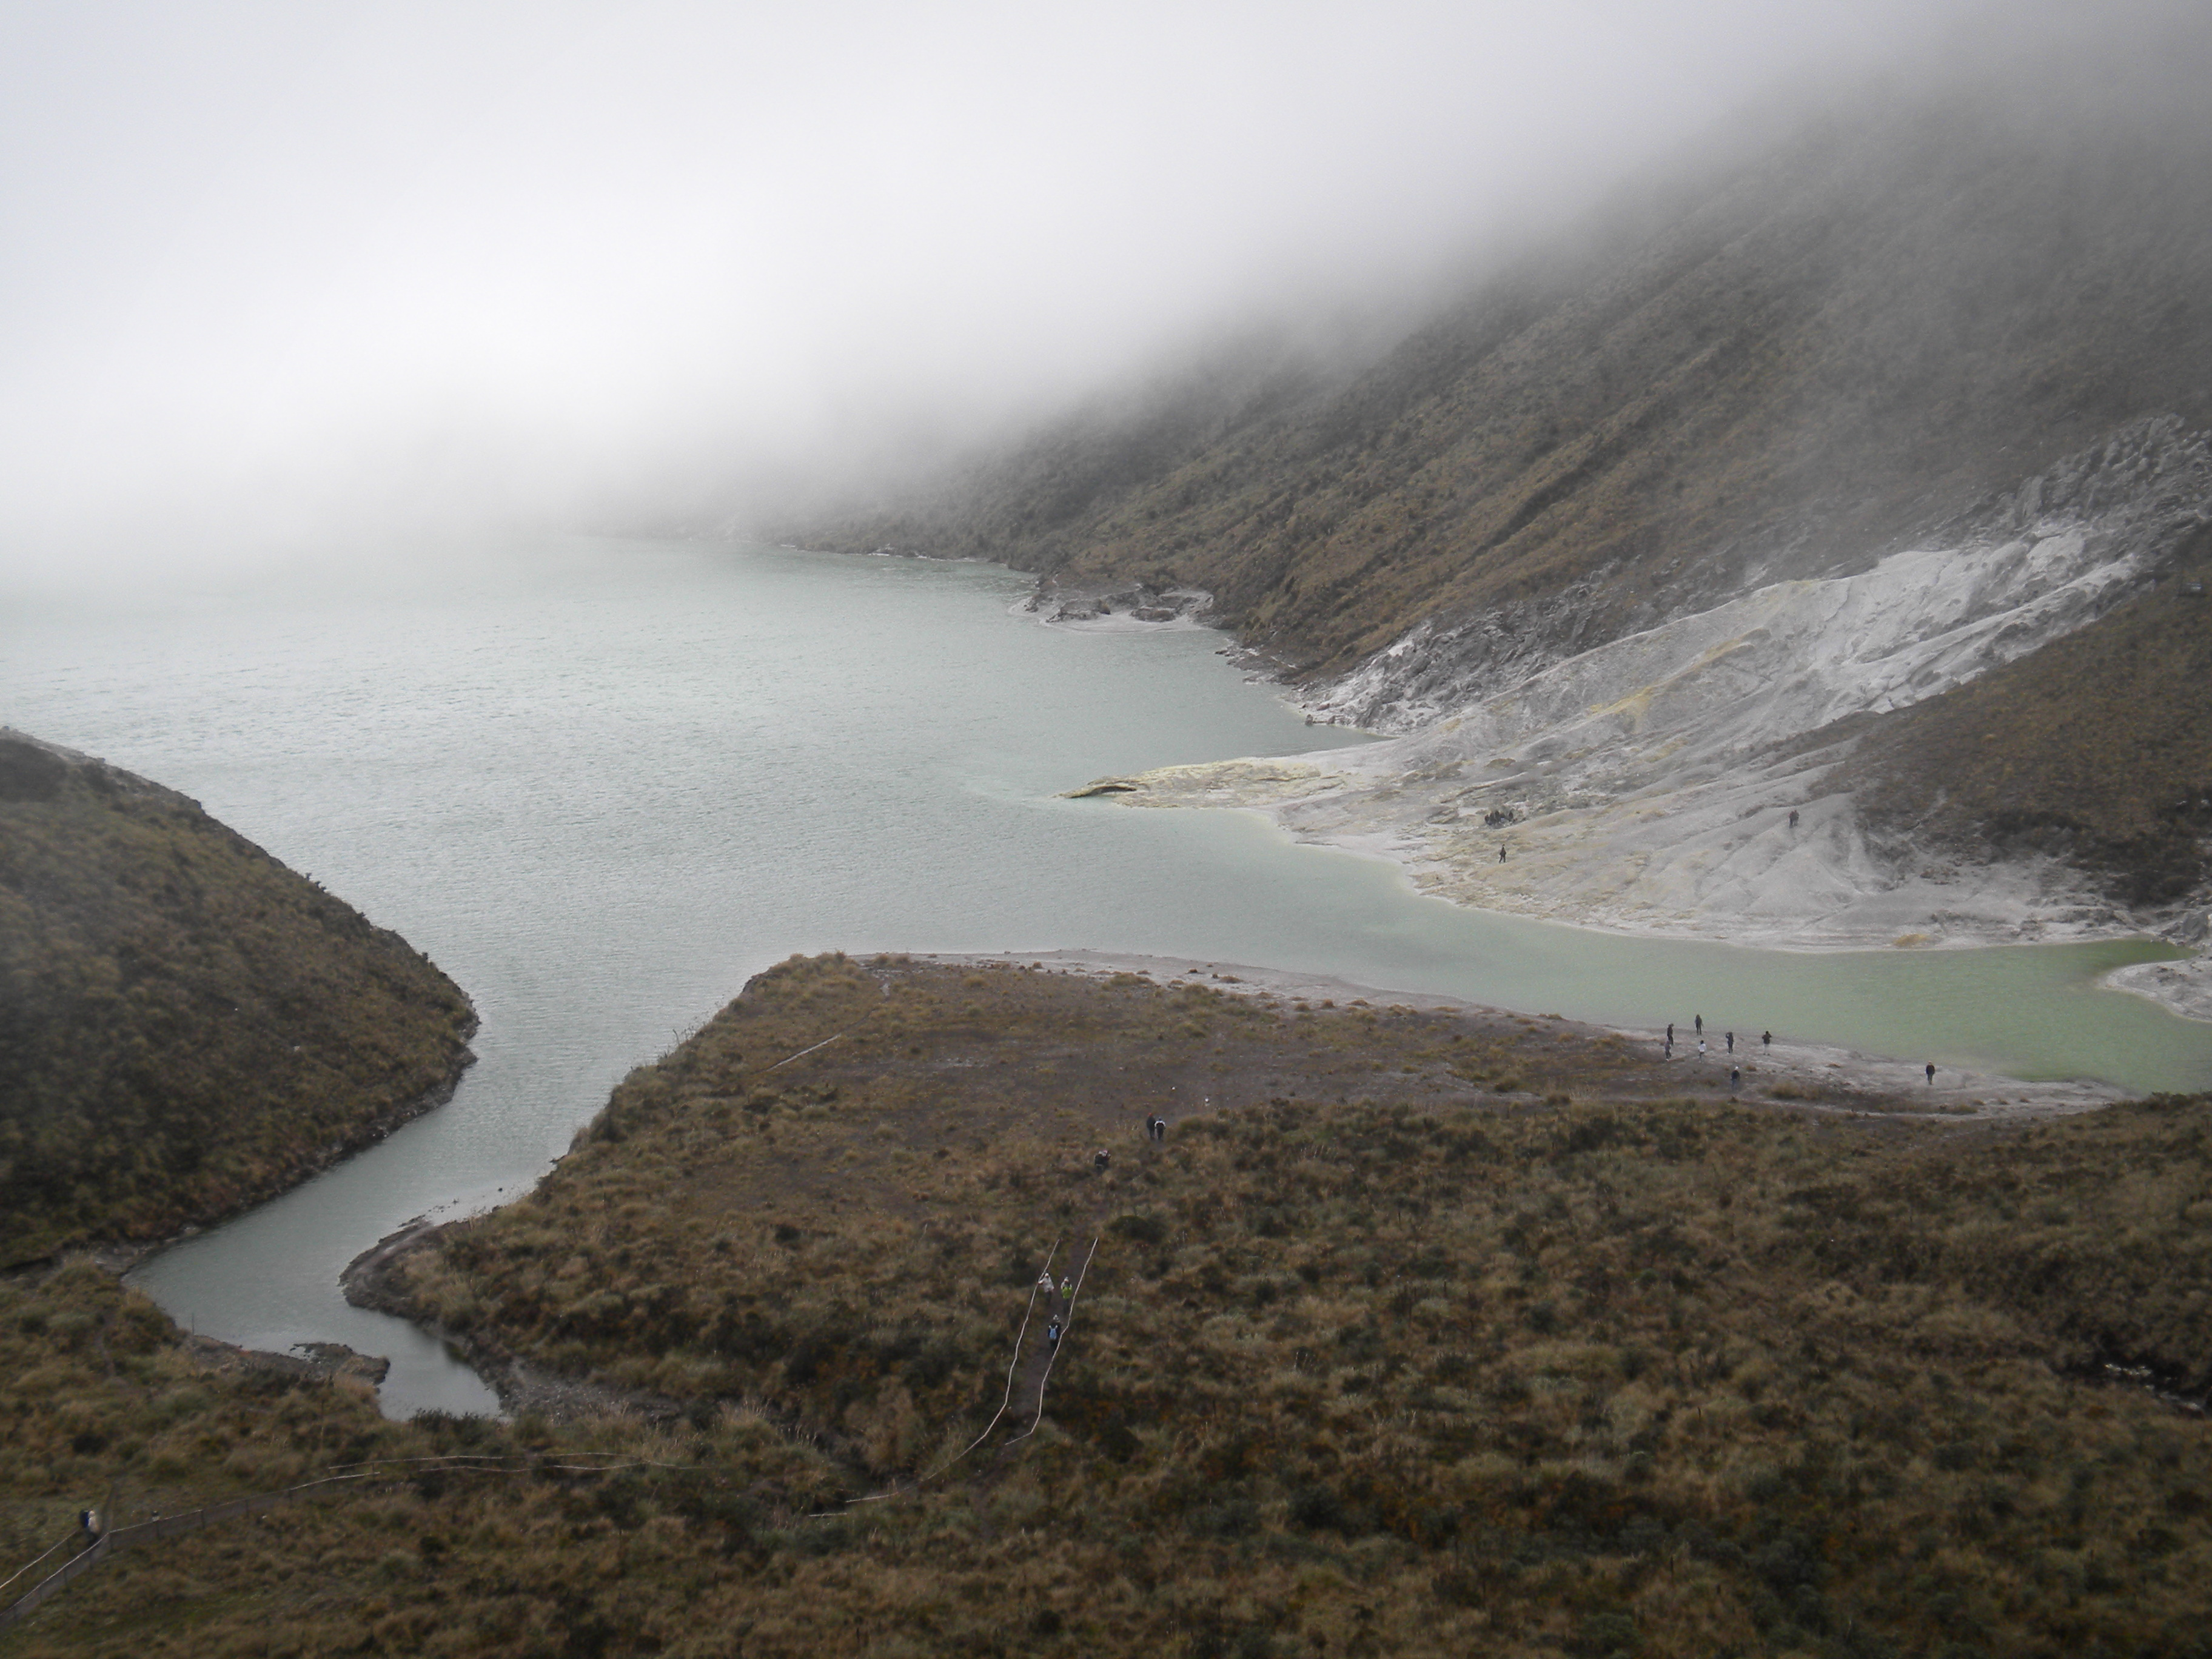 laguna verde, Colombia